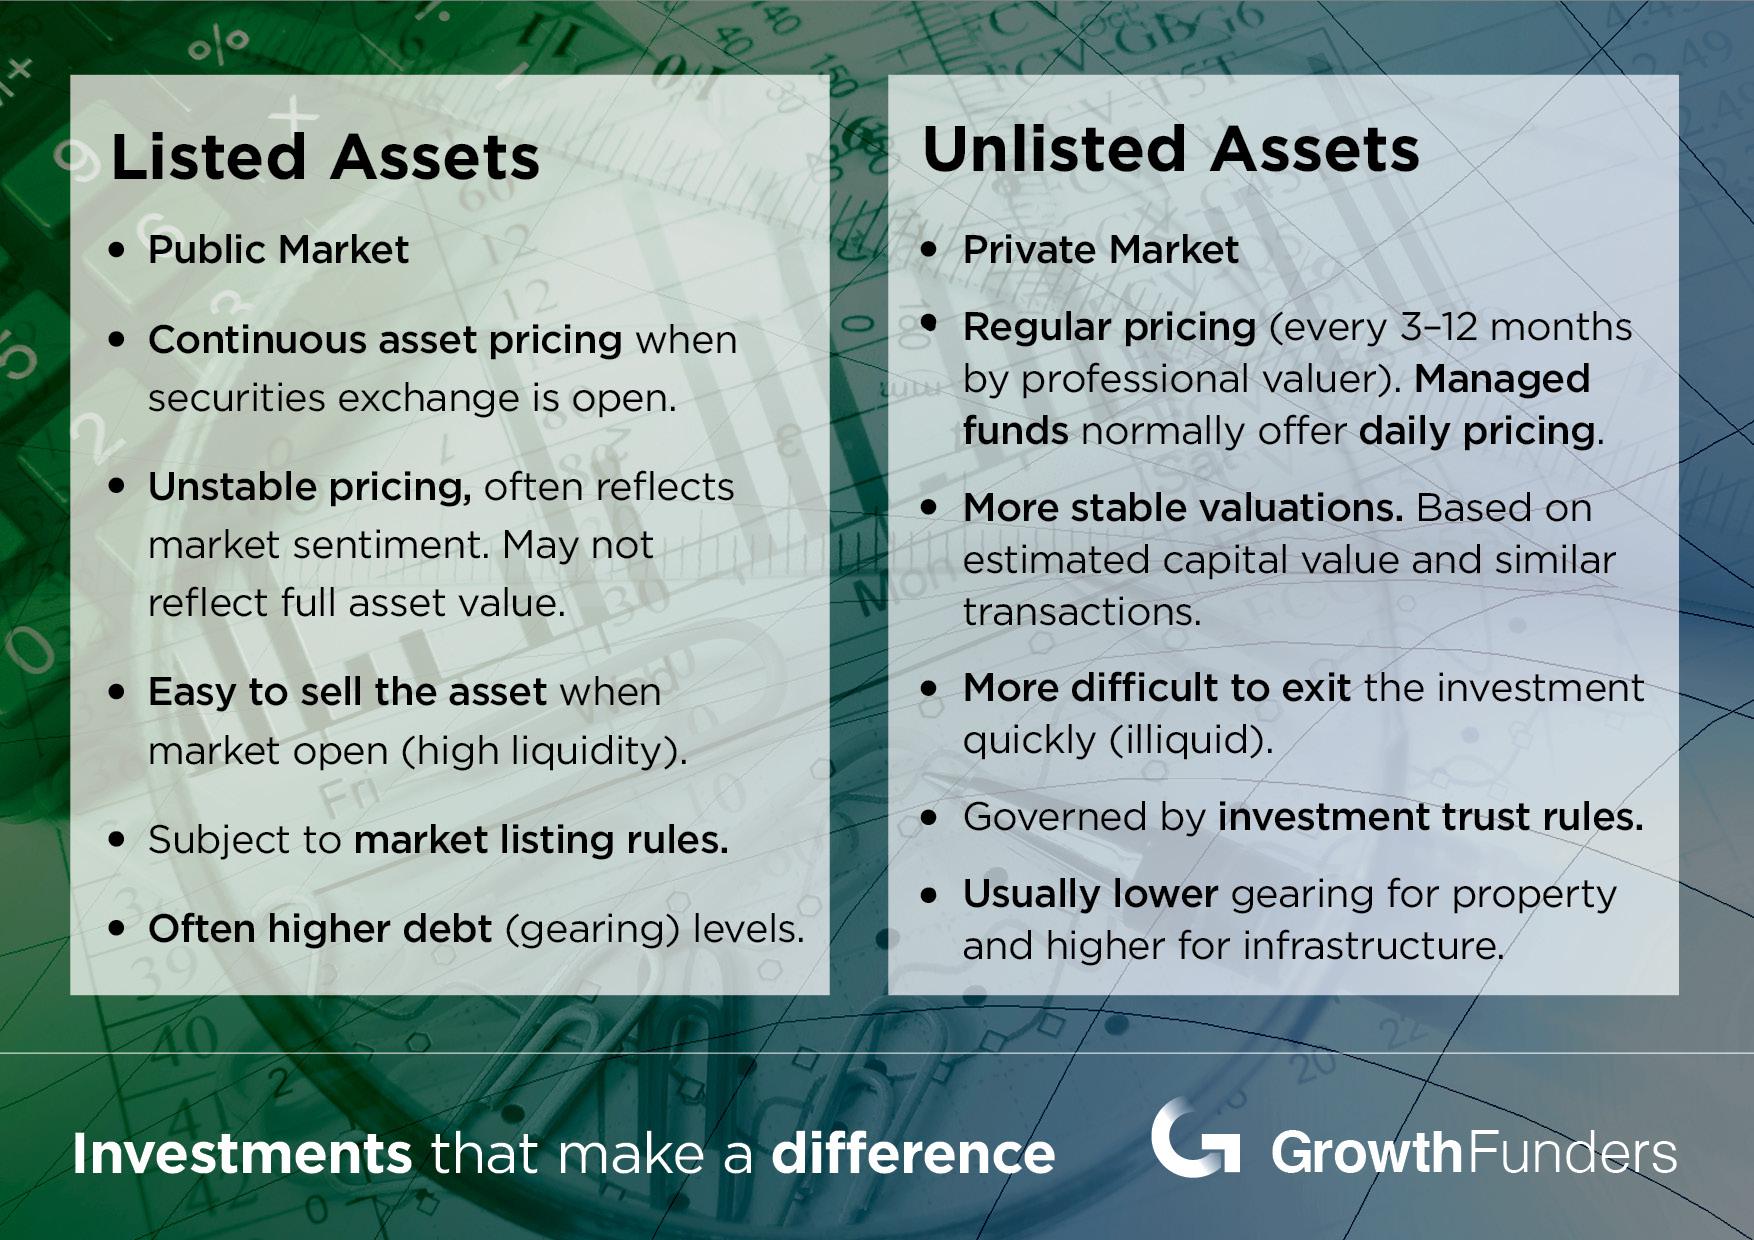 Listed-Unlisted-Assets-Blog.jpg